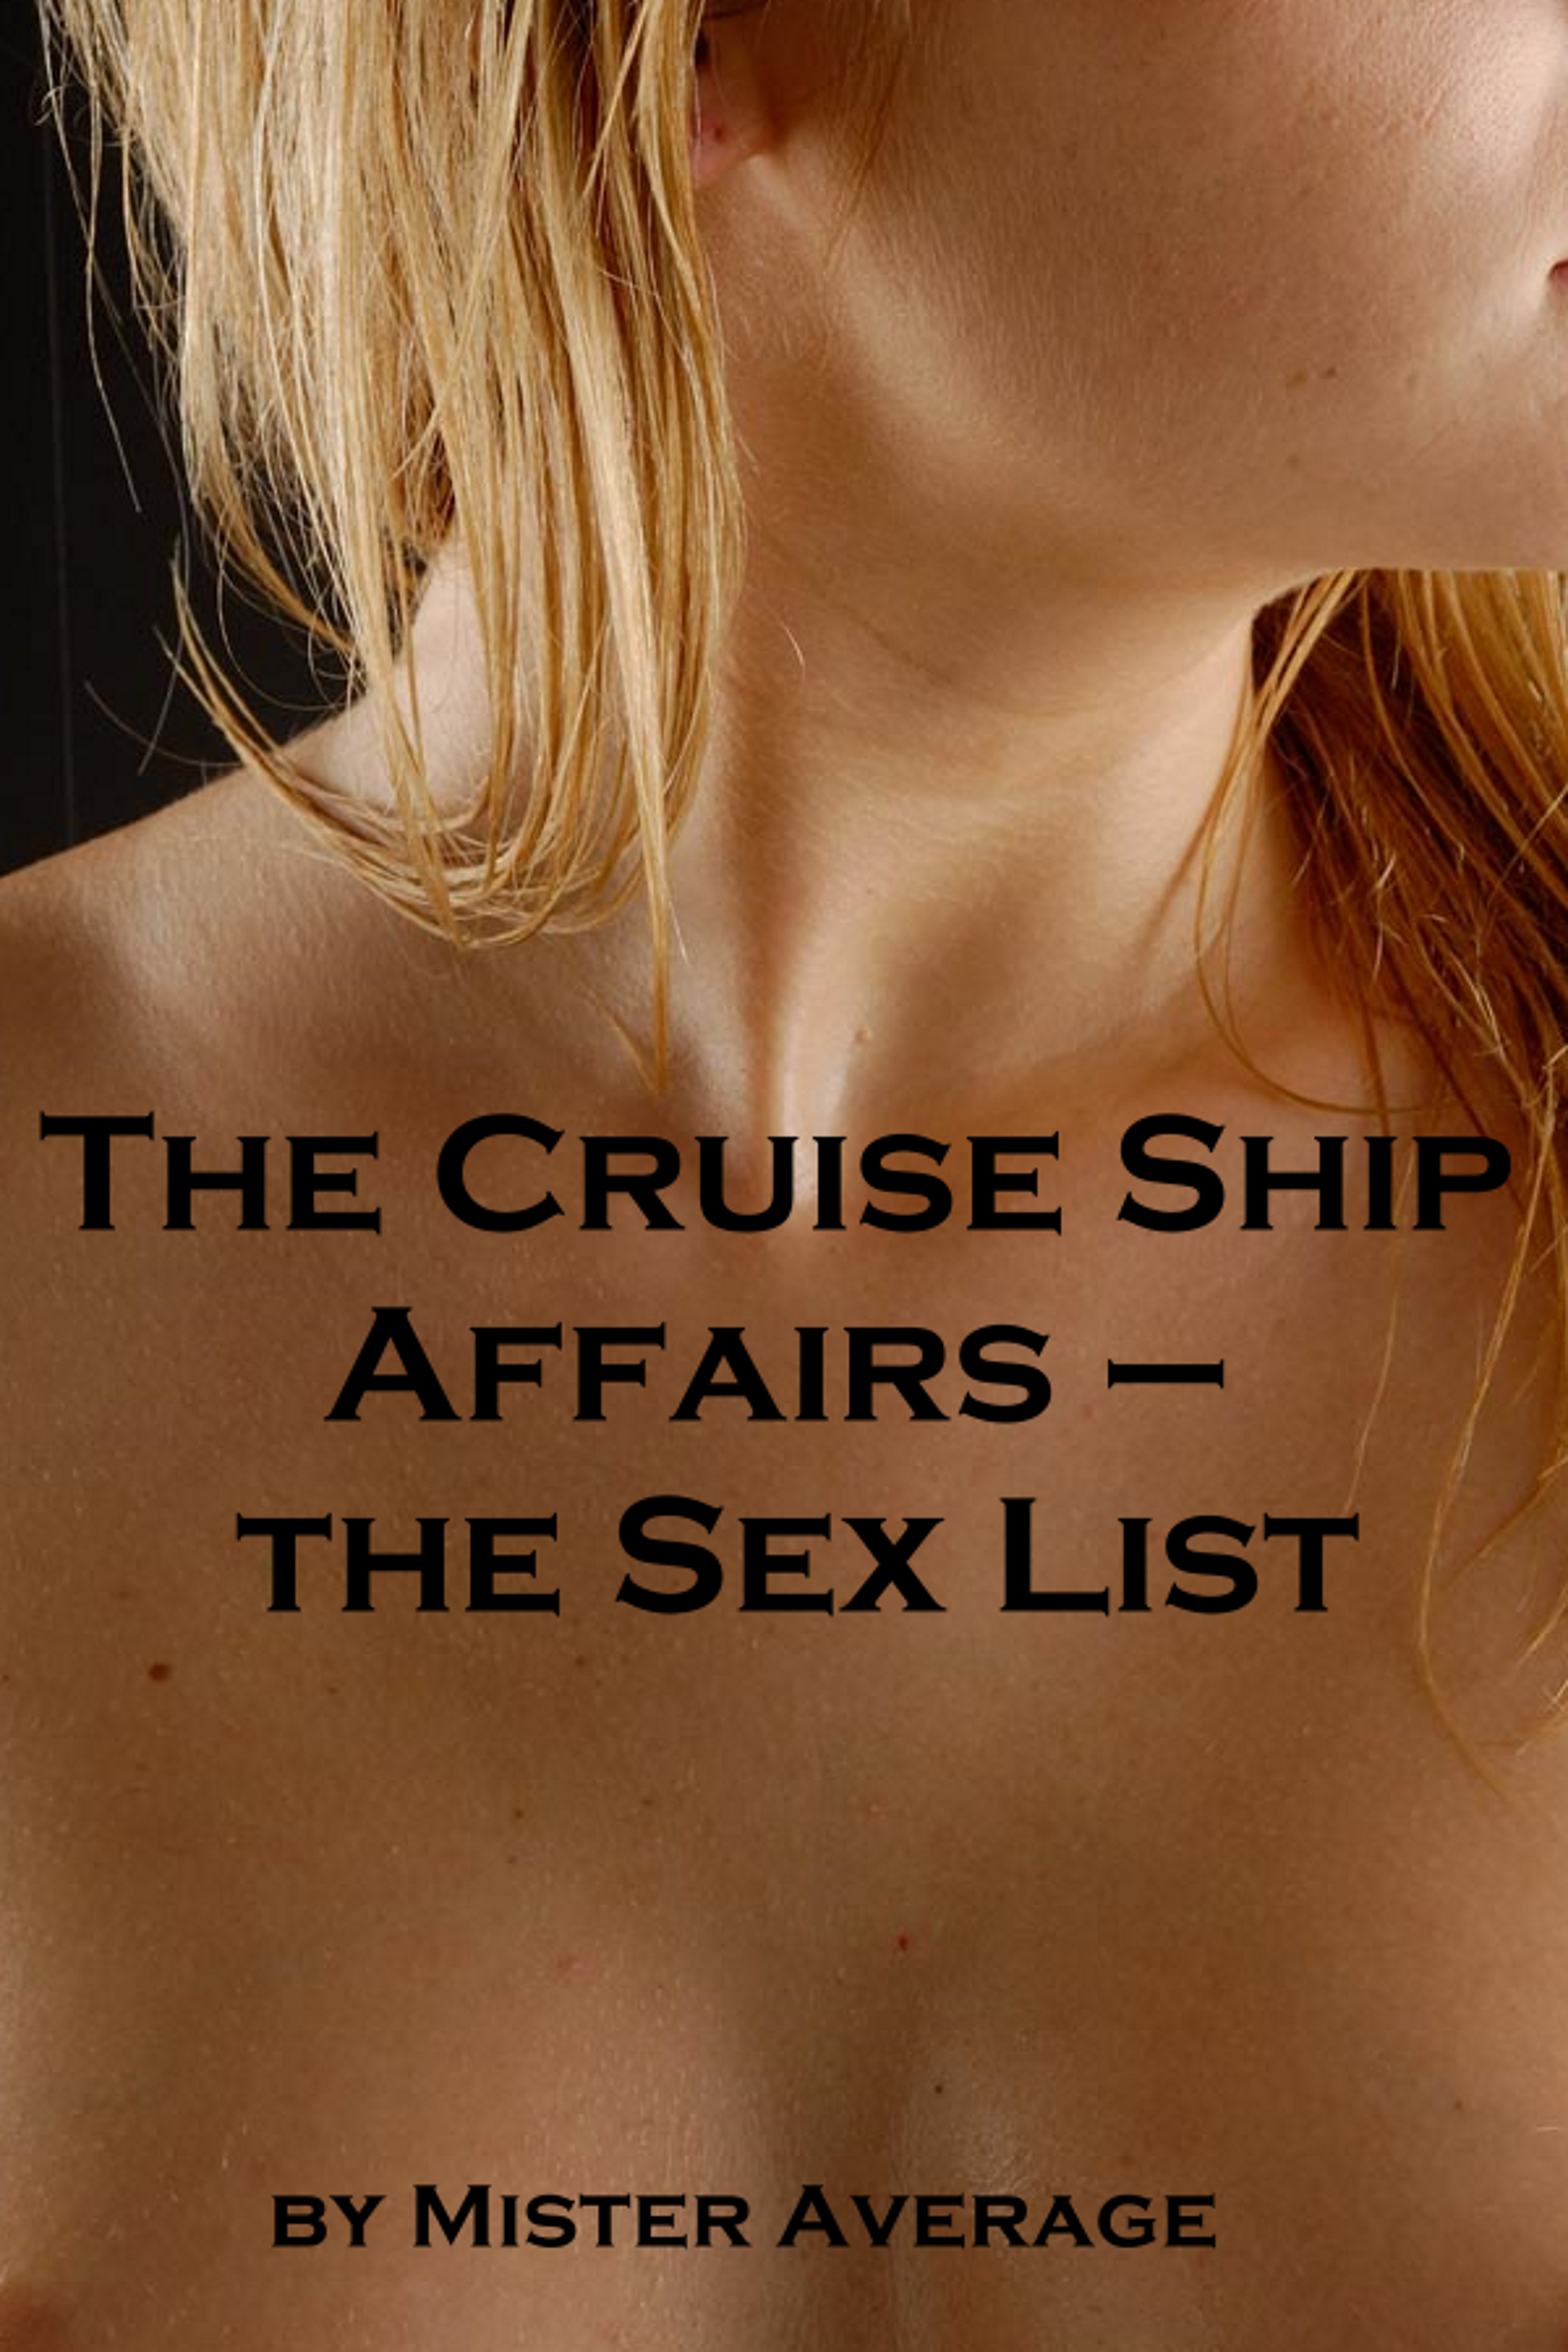 Mature nudes, MILF porn pics - Nerd Nudes